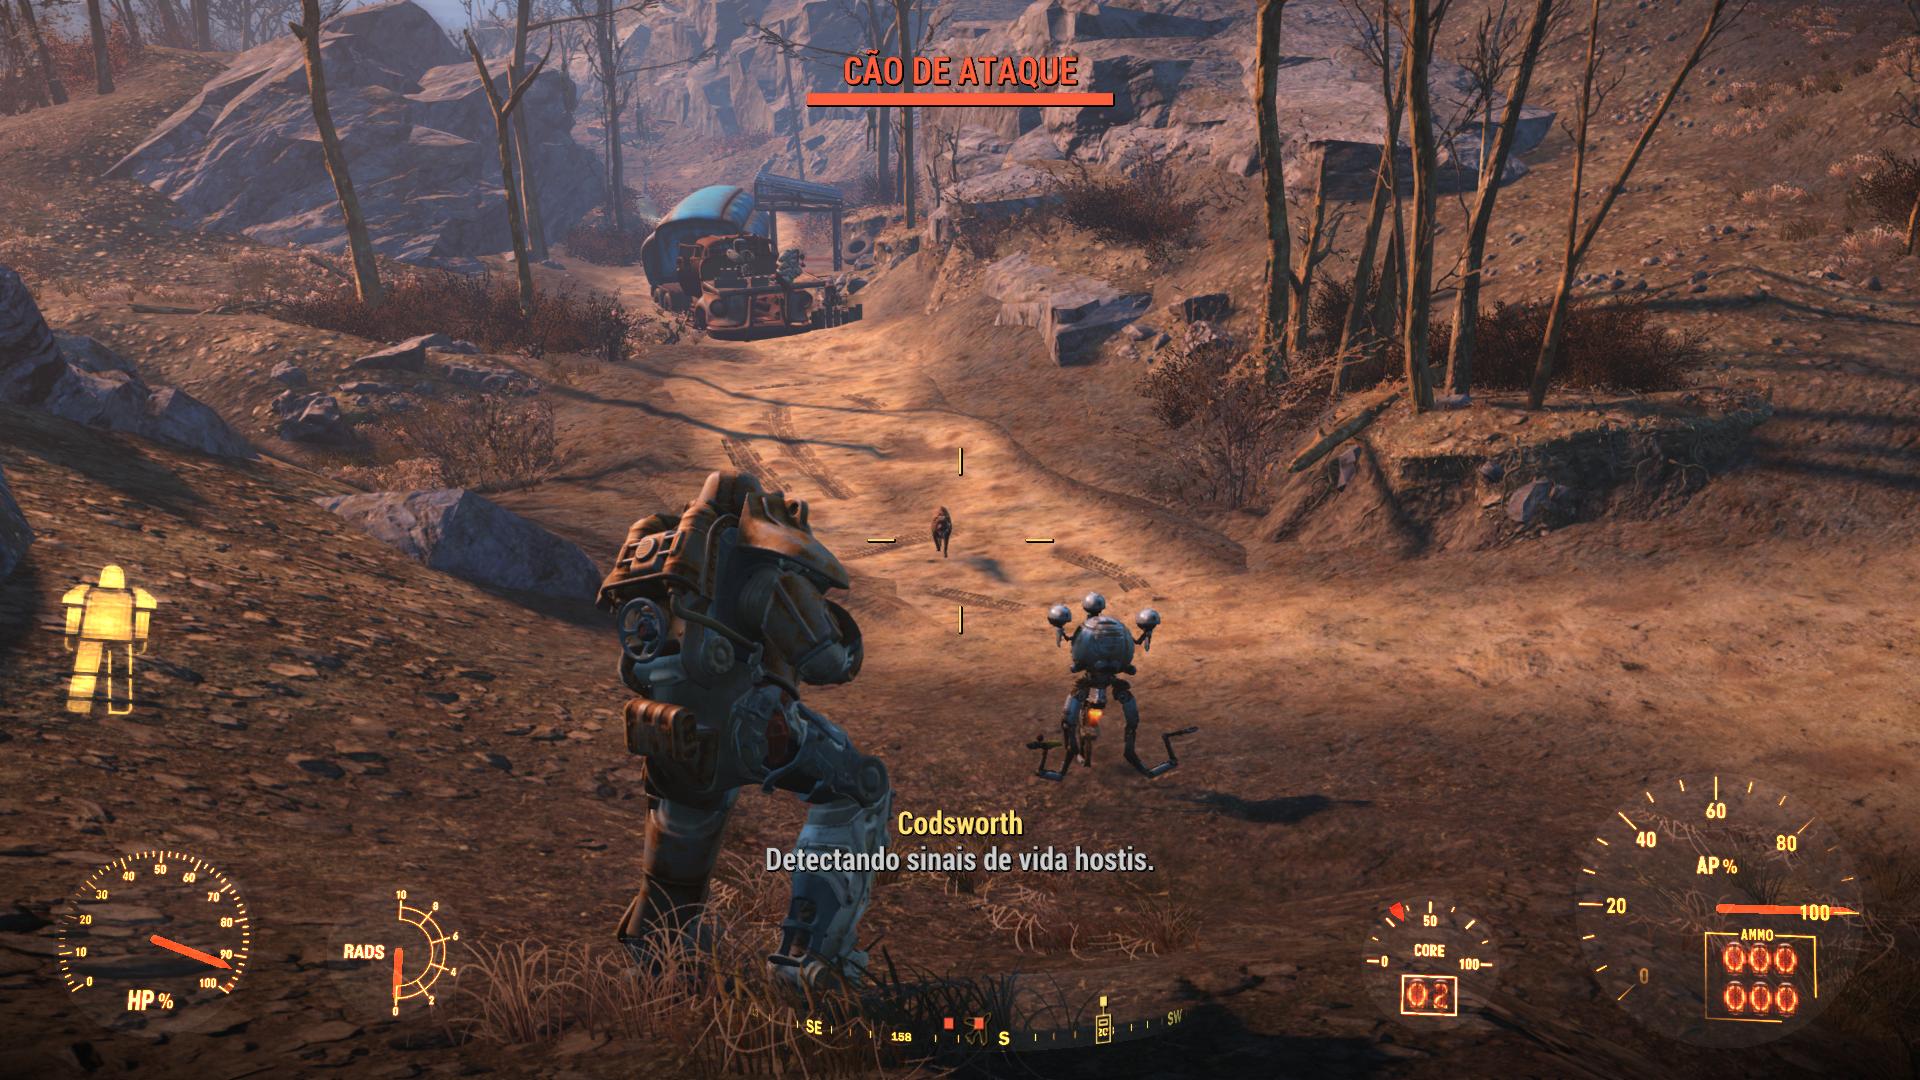 fallout4_gameplay_chiuauadospampas_1